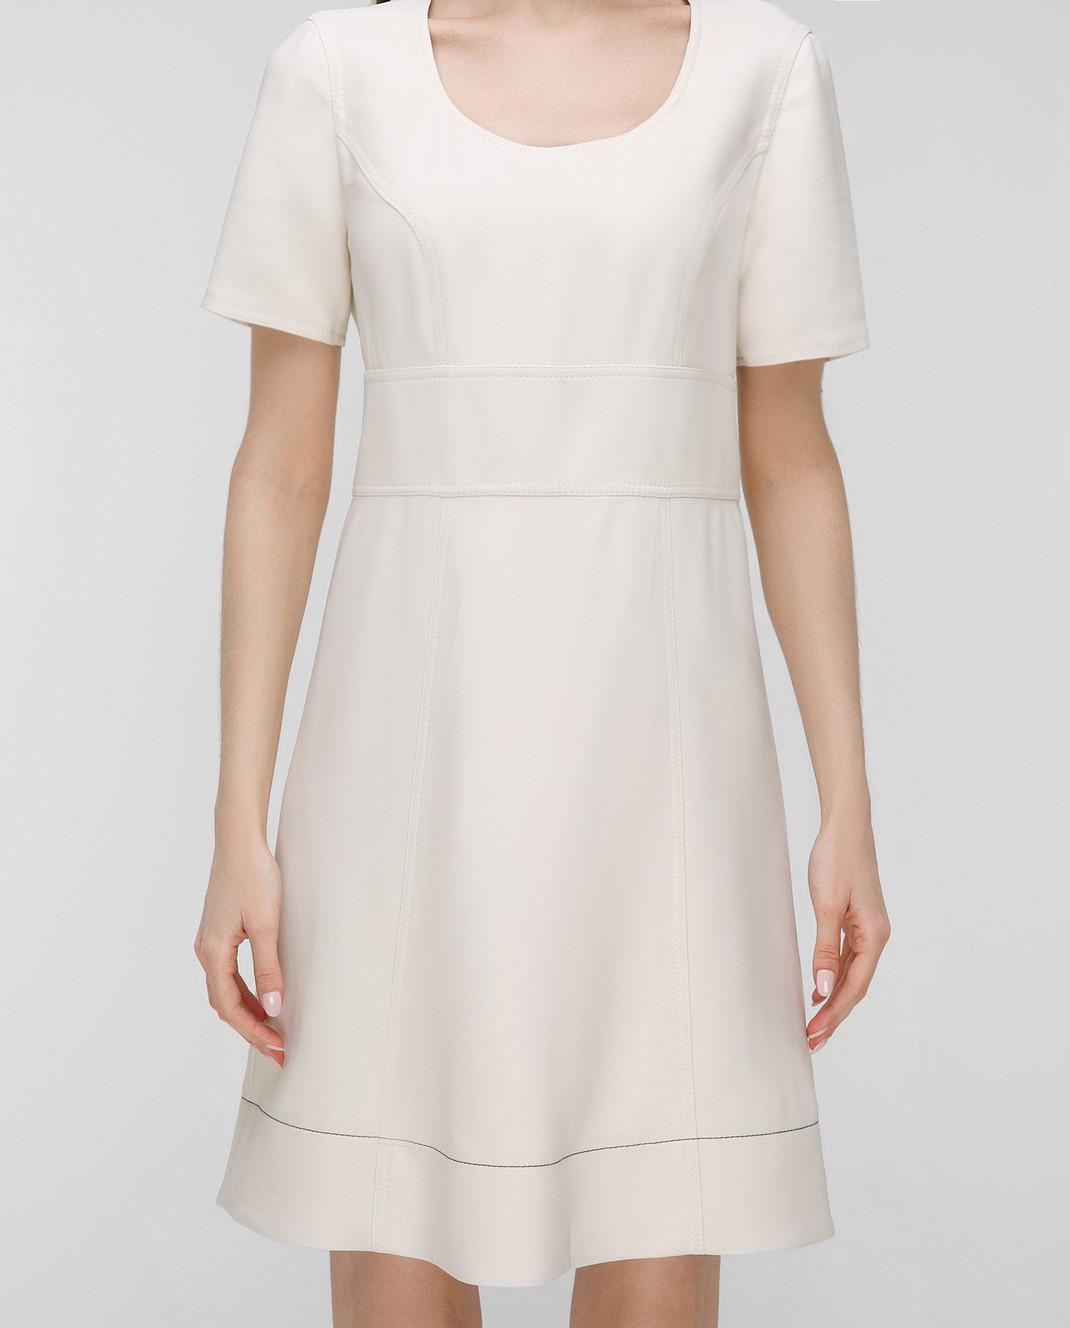 Sonia Rykiel Светло-бежевое платье 17202425 изображение 3